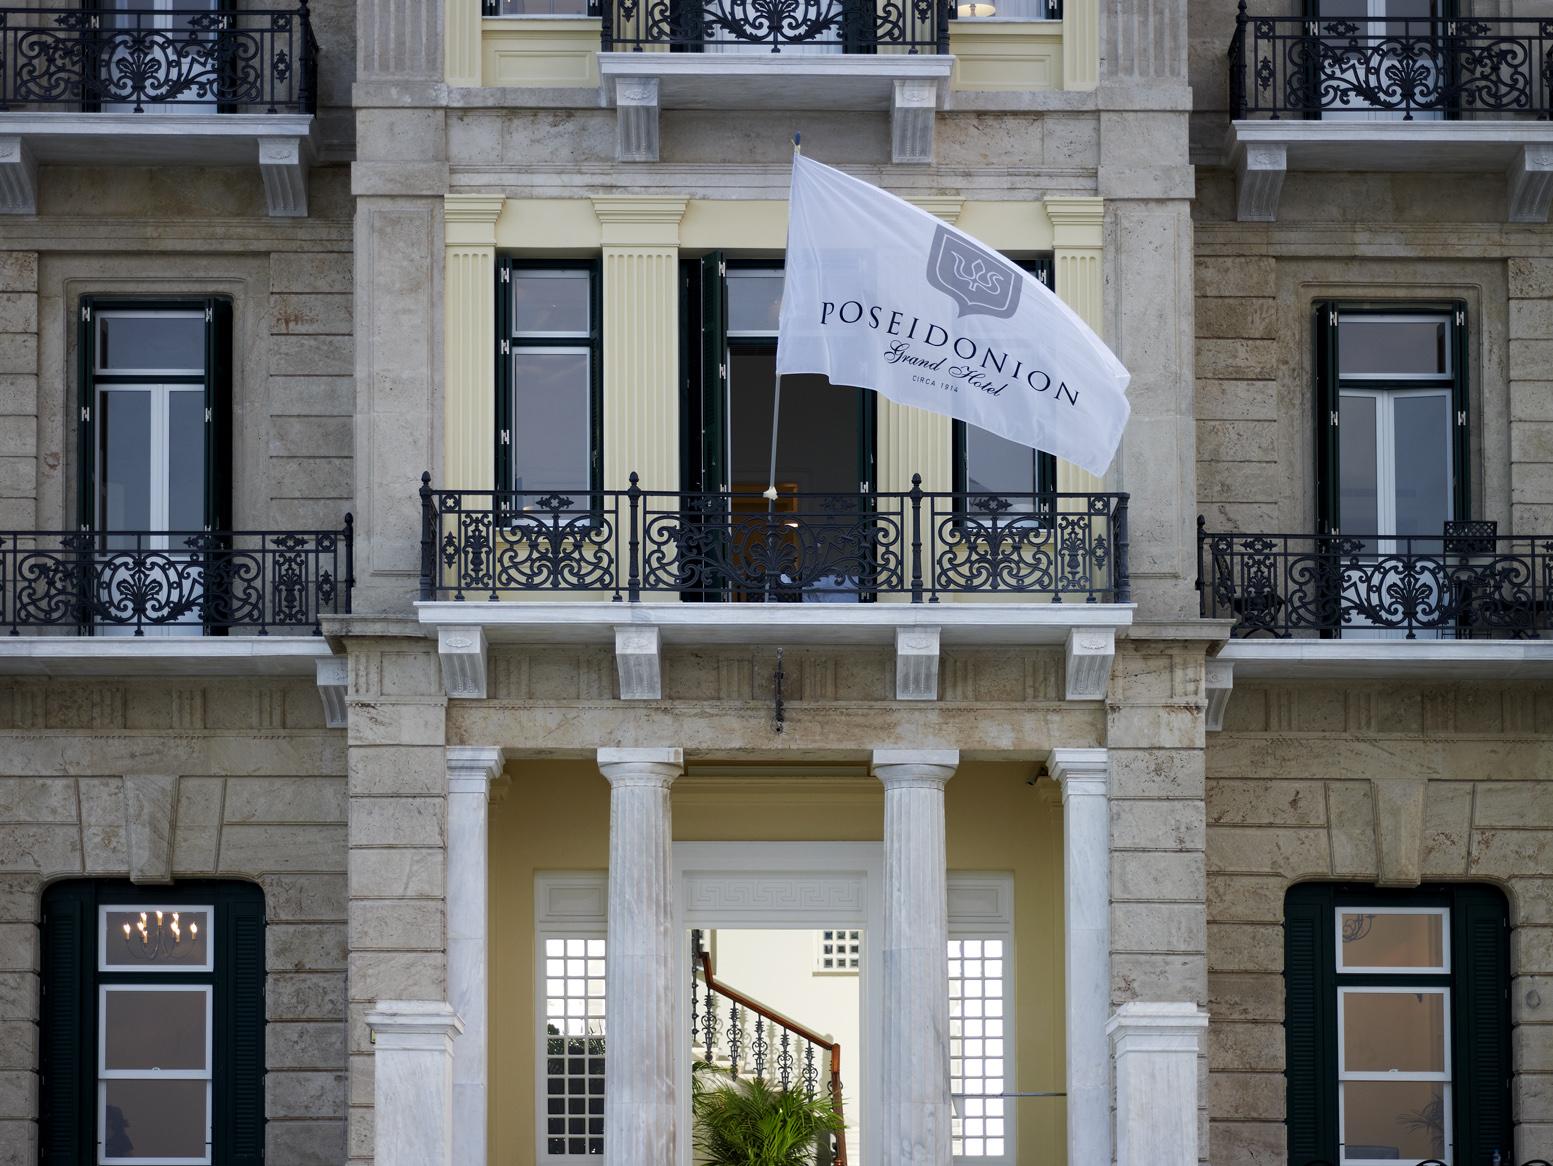 The Poseidon Grand Hotel on Spetses.